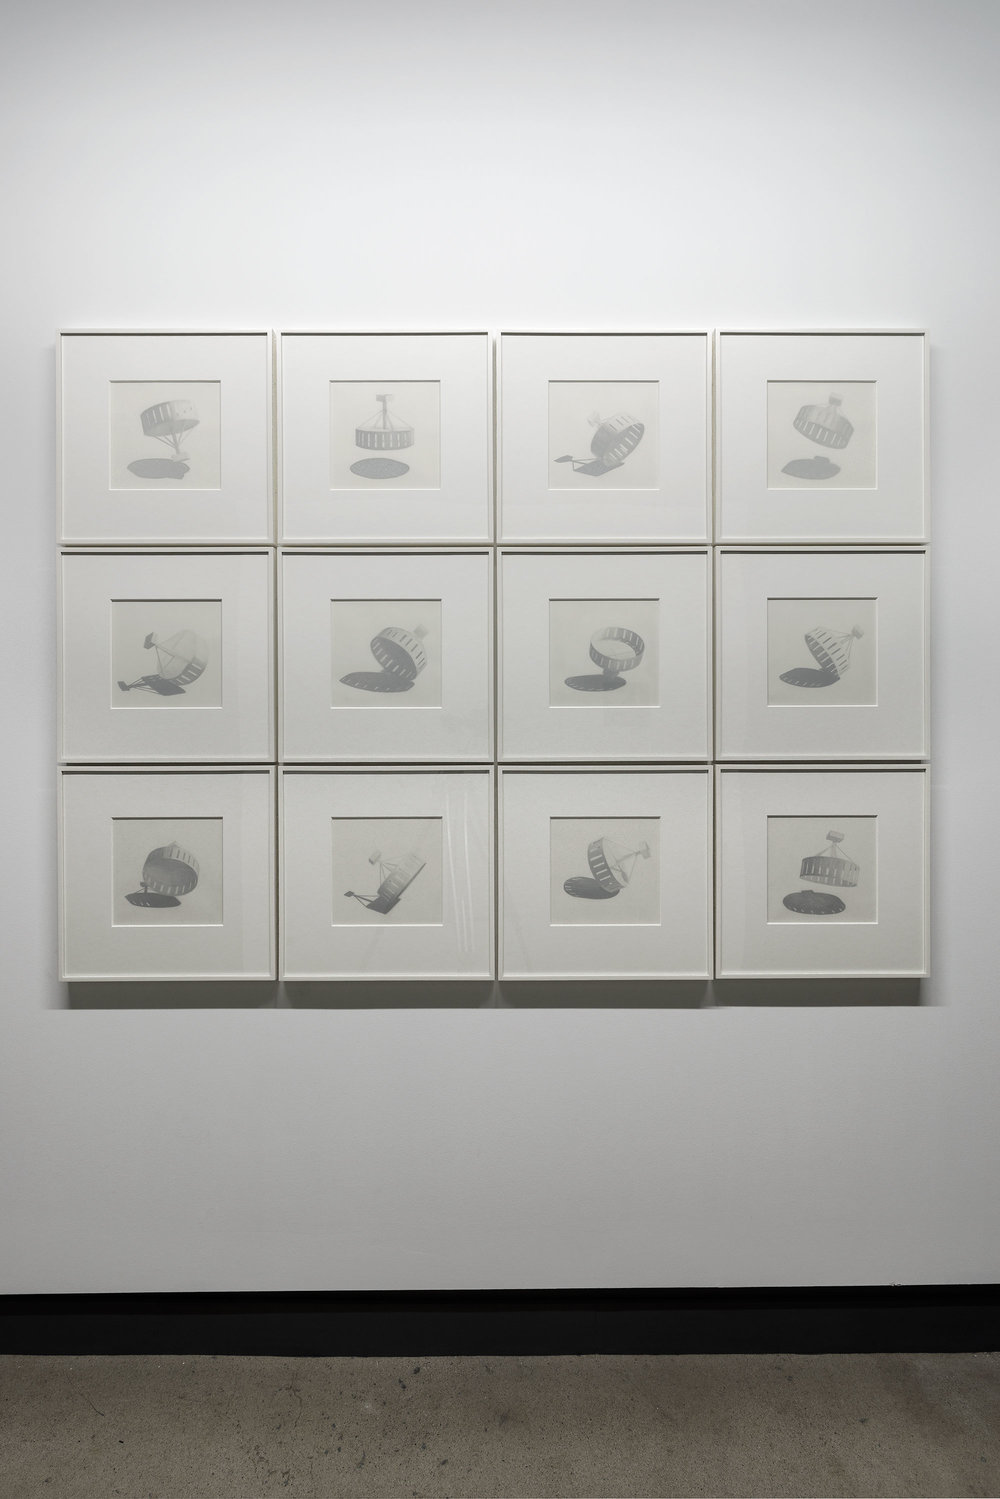 © David K. Ross, Horologica(1996). Exhibition view. Photo: Guy L'Heureux.